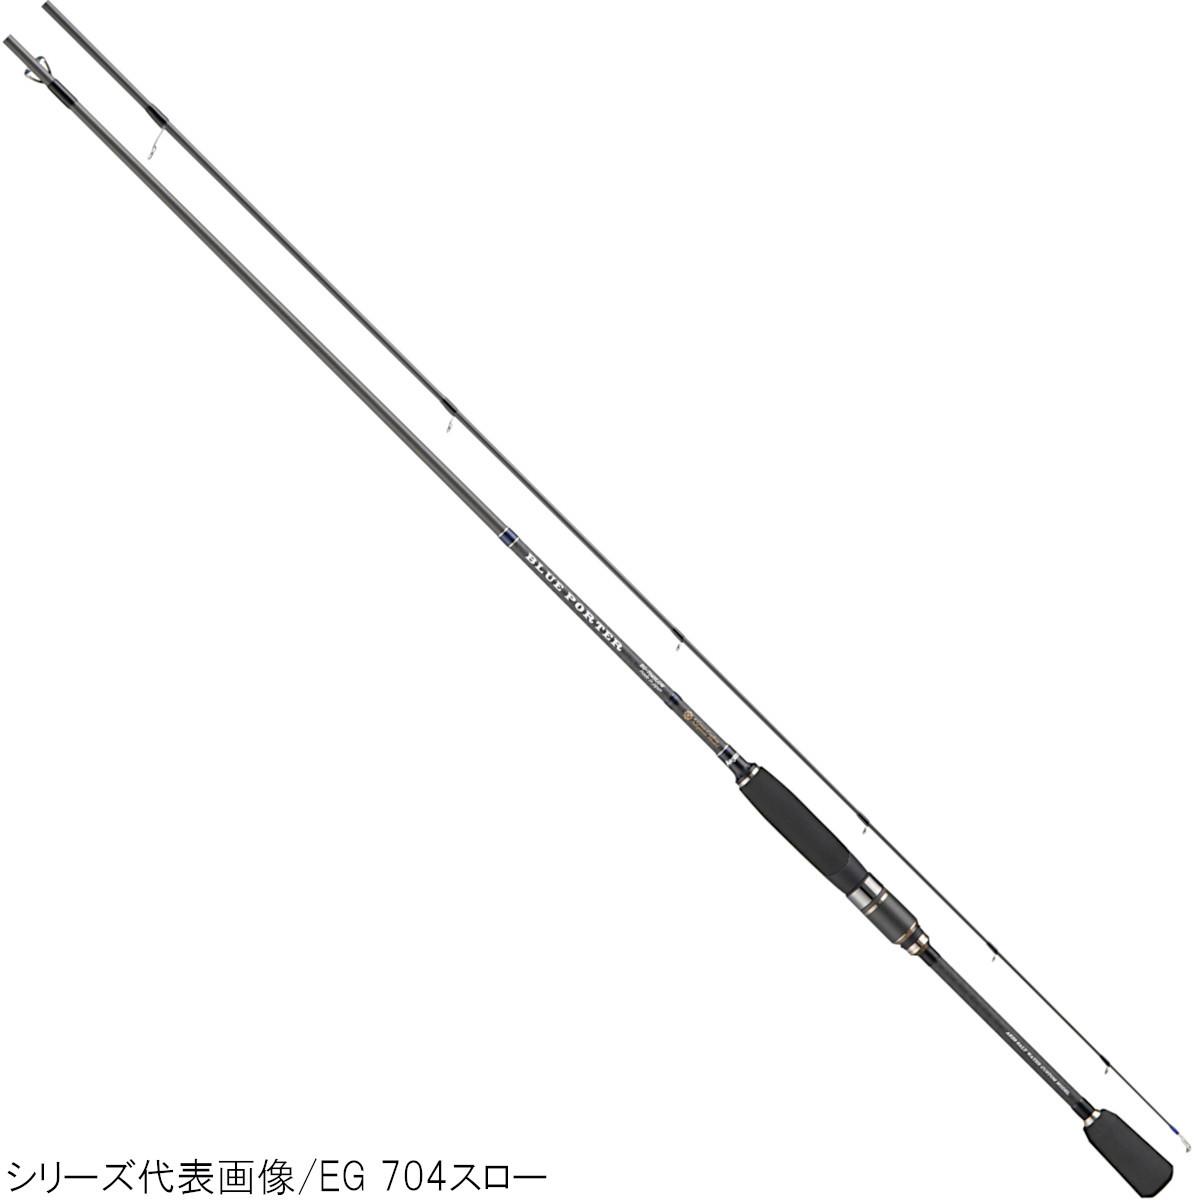 ARES ブルーポーター EG 806ML(エギングロッド) 宇崎日新【同梱不可】